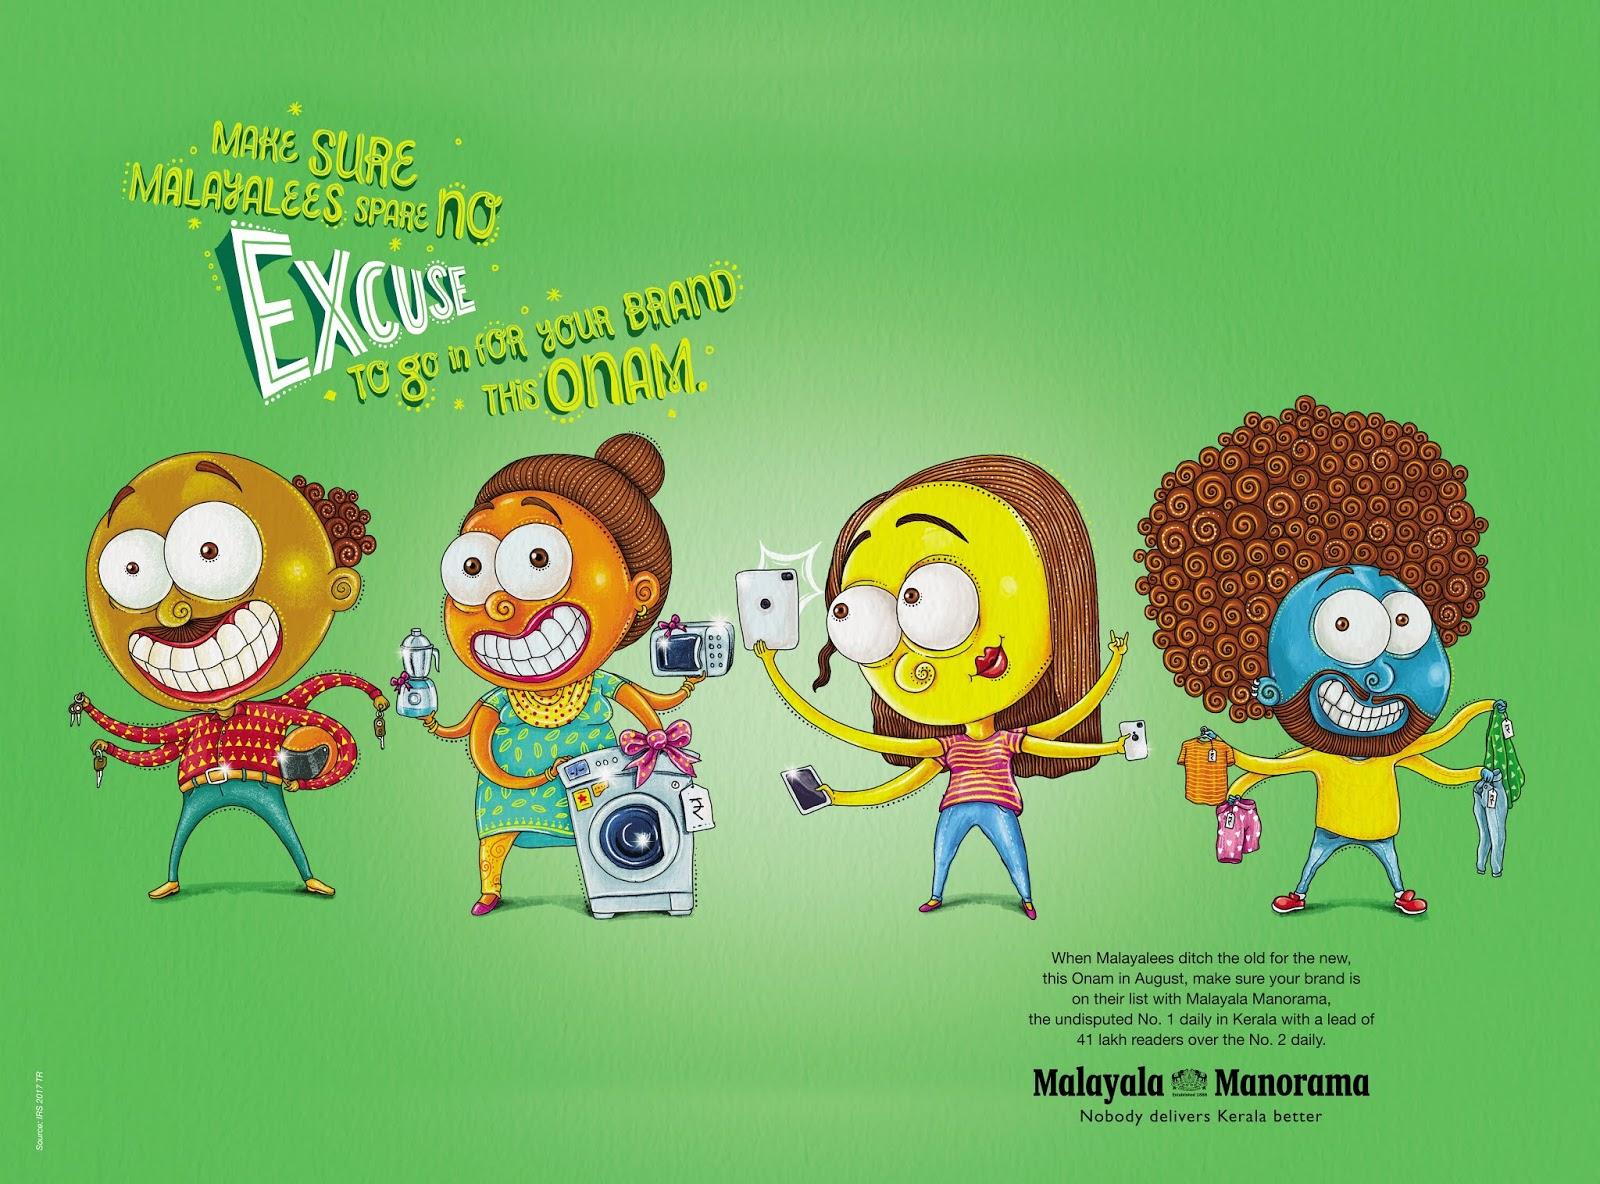 Malayala Manorama | The Season of Excuses 5 | Stark Communications Pvt Ltd